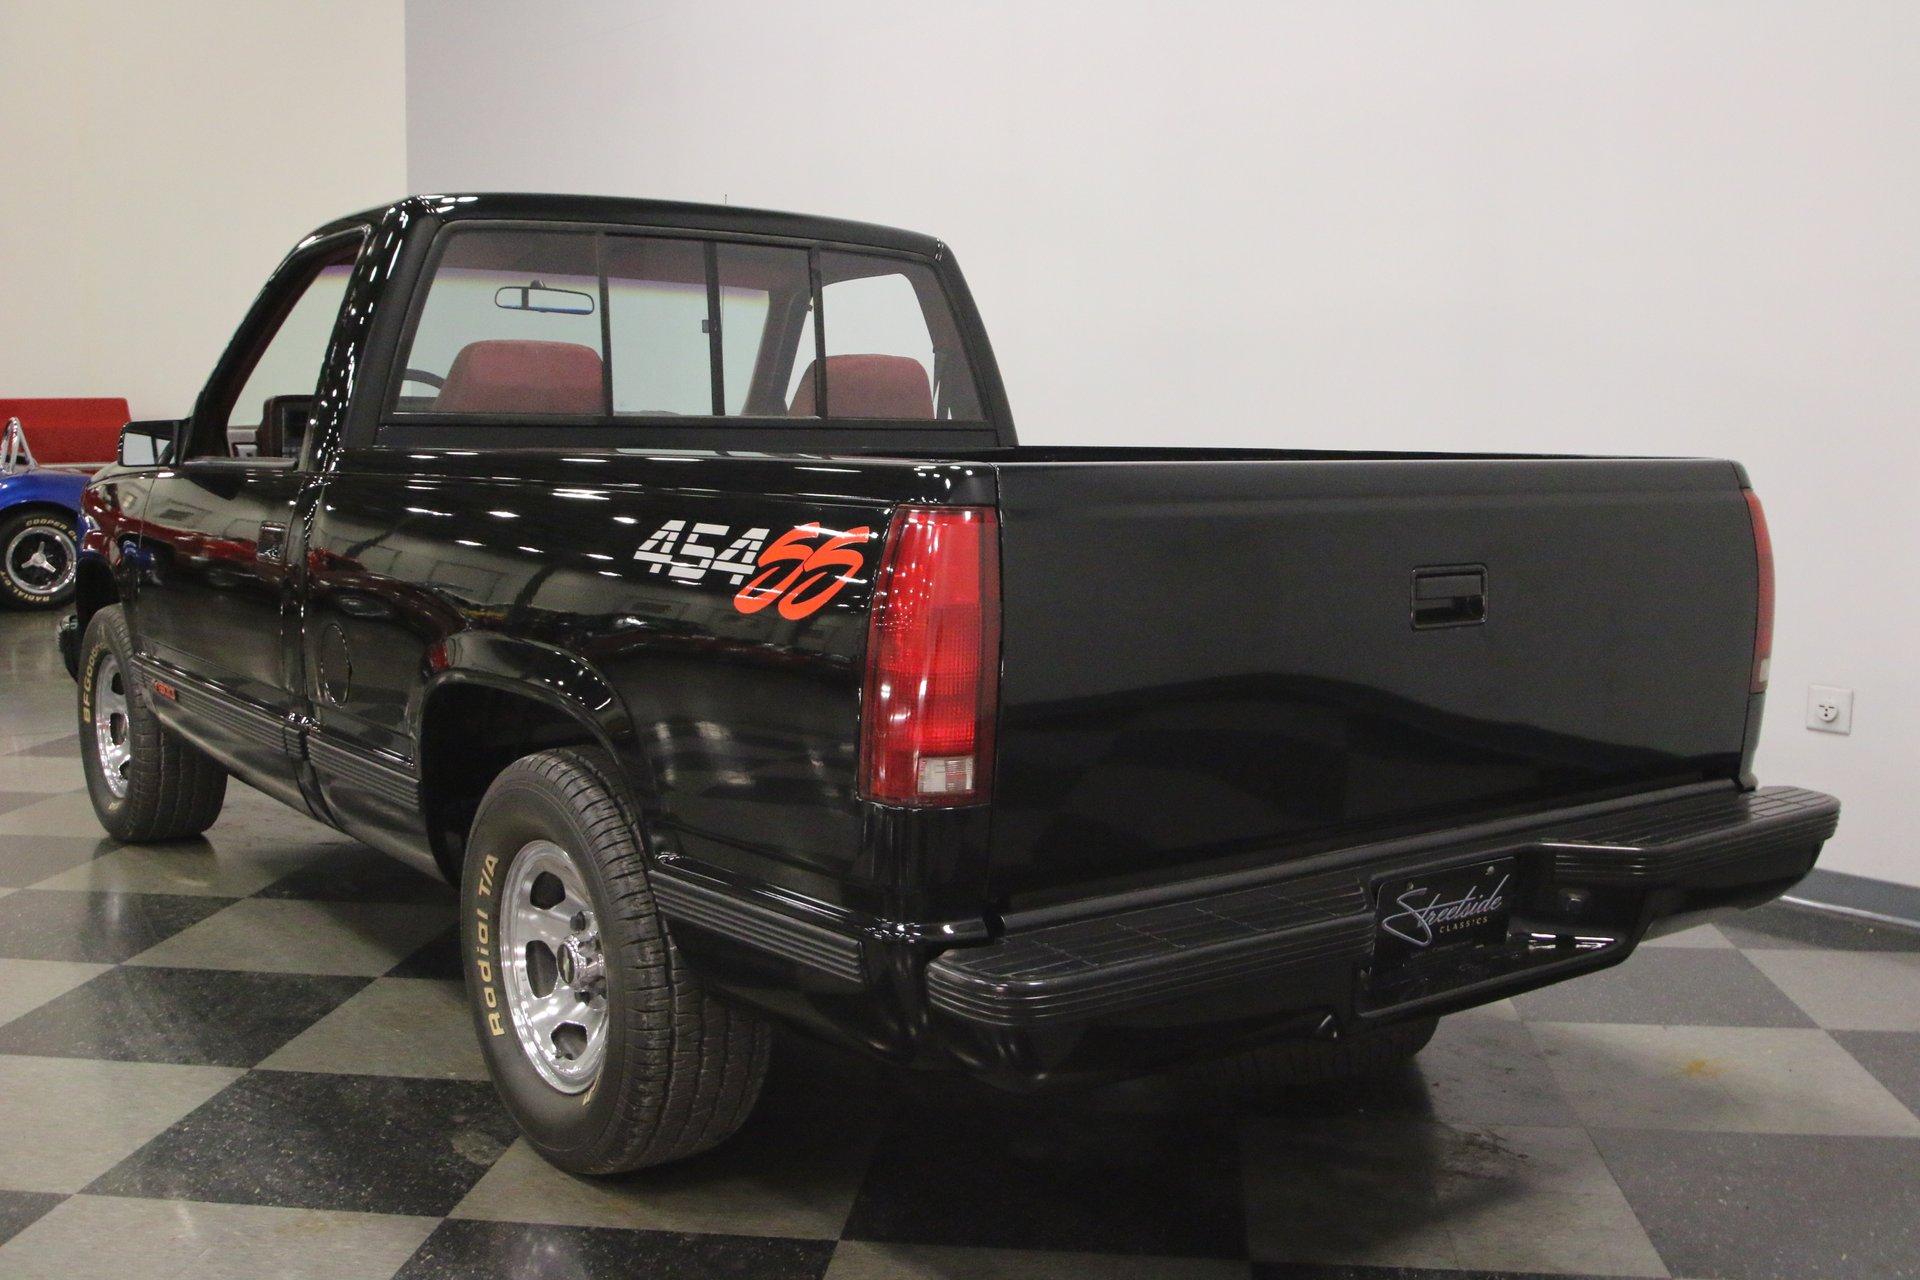 1992 Chevrolet Silverado 454 SS for sale #115111 | MCG